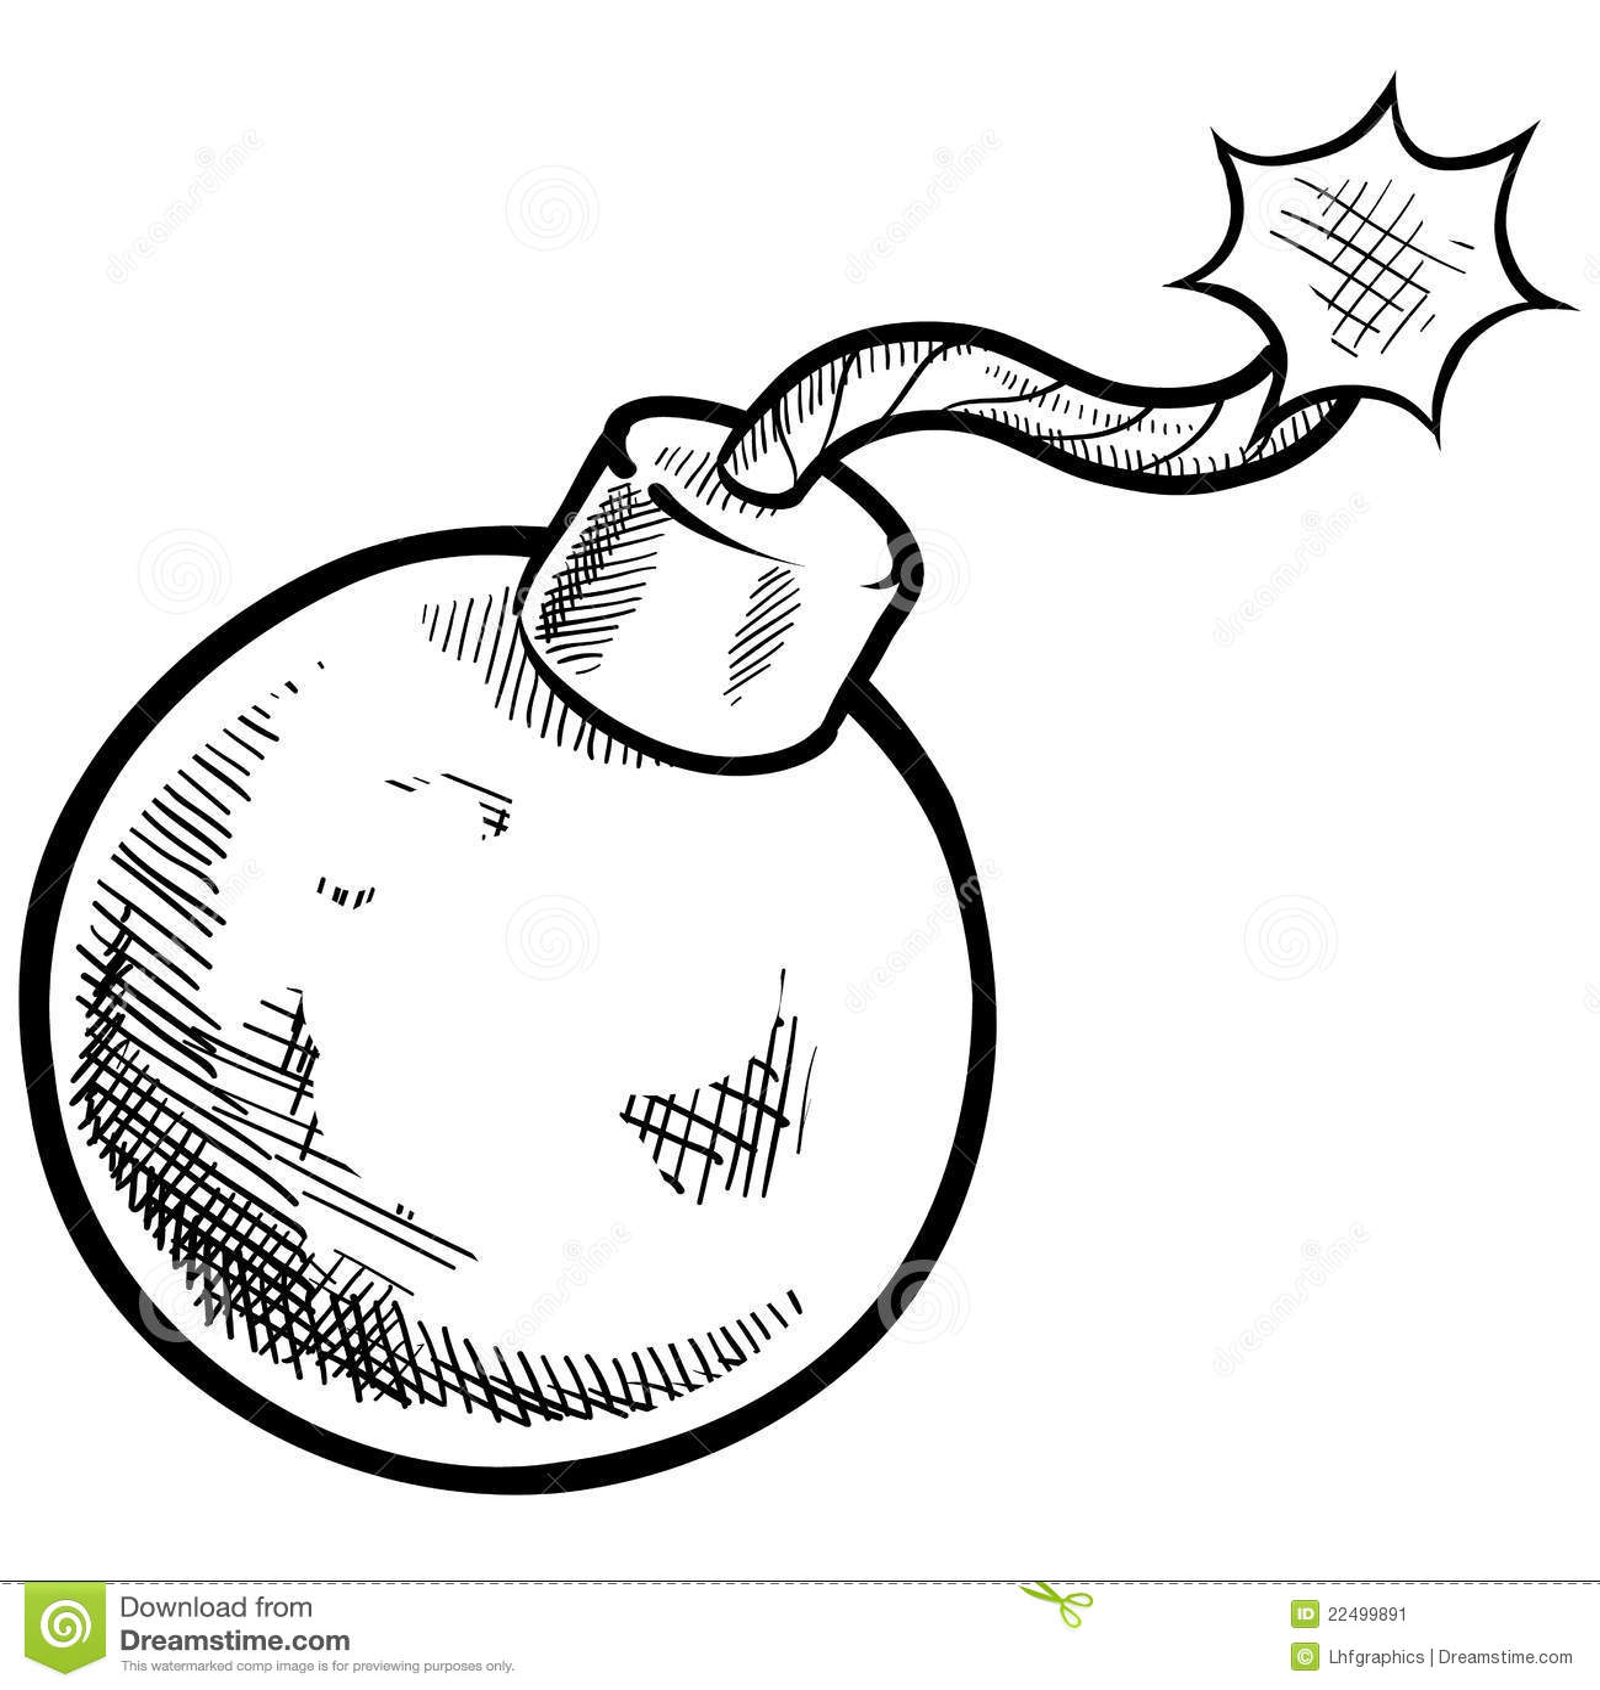 retro bomb drawing stock image image 22499891 grenada vector diseases grenade vector images